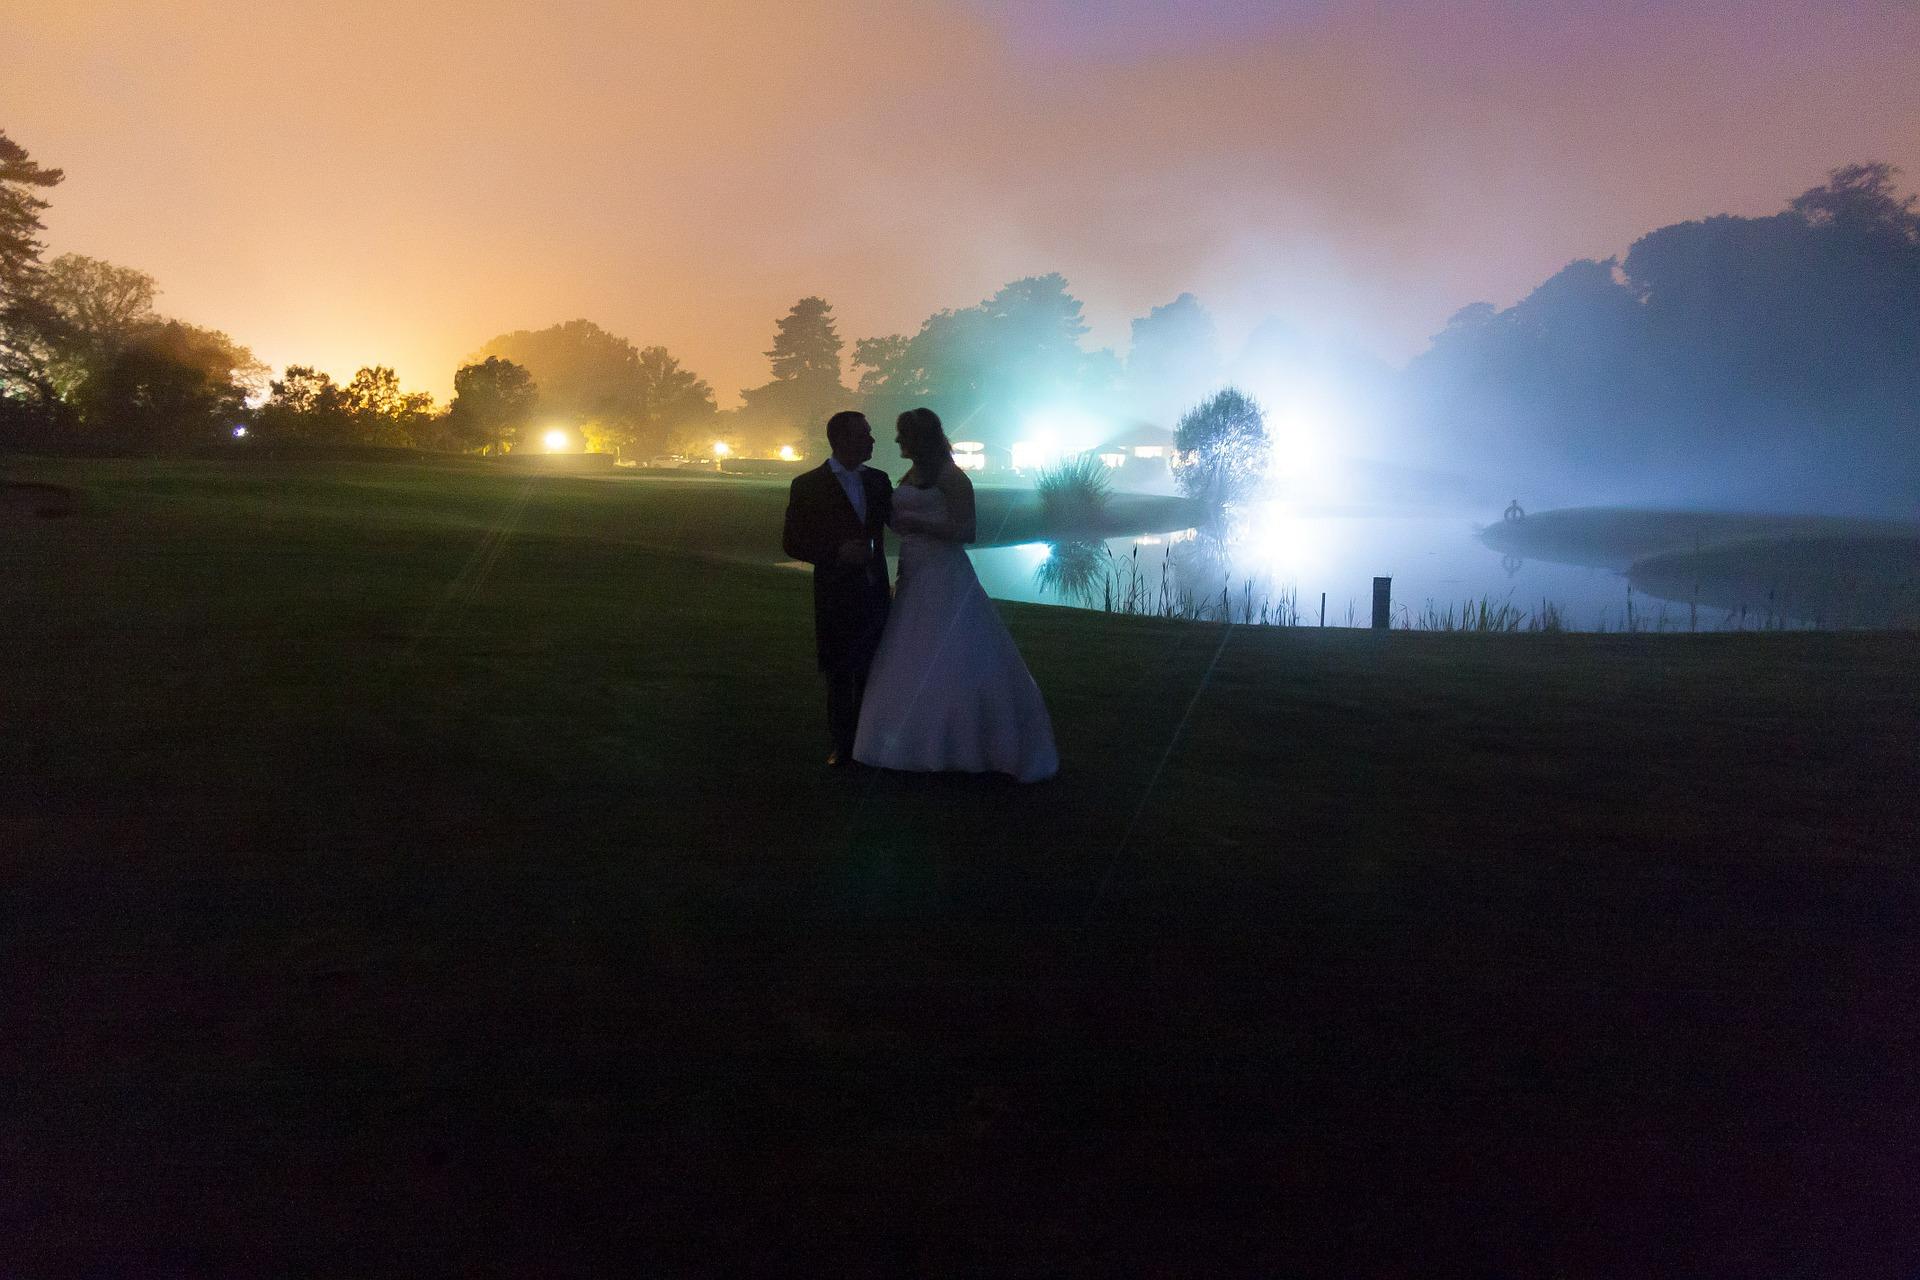 wedding-588436_1920